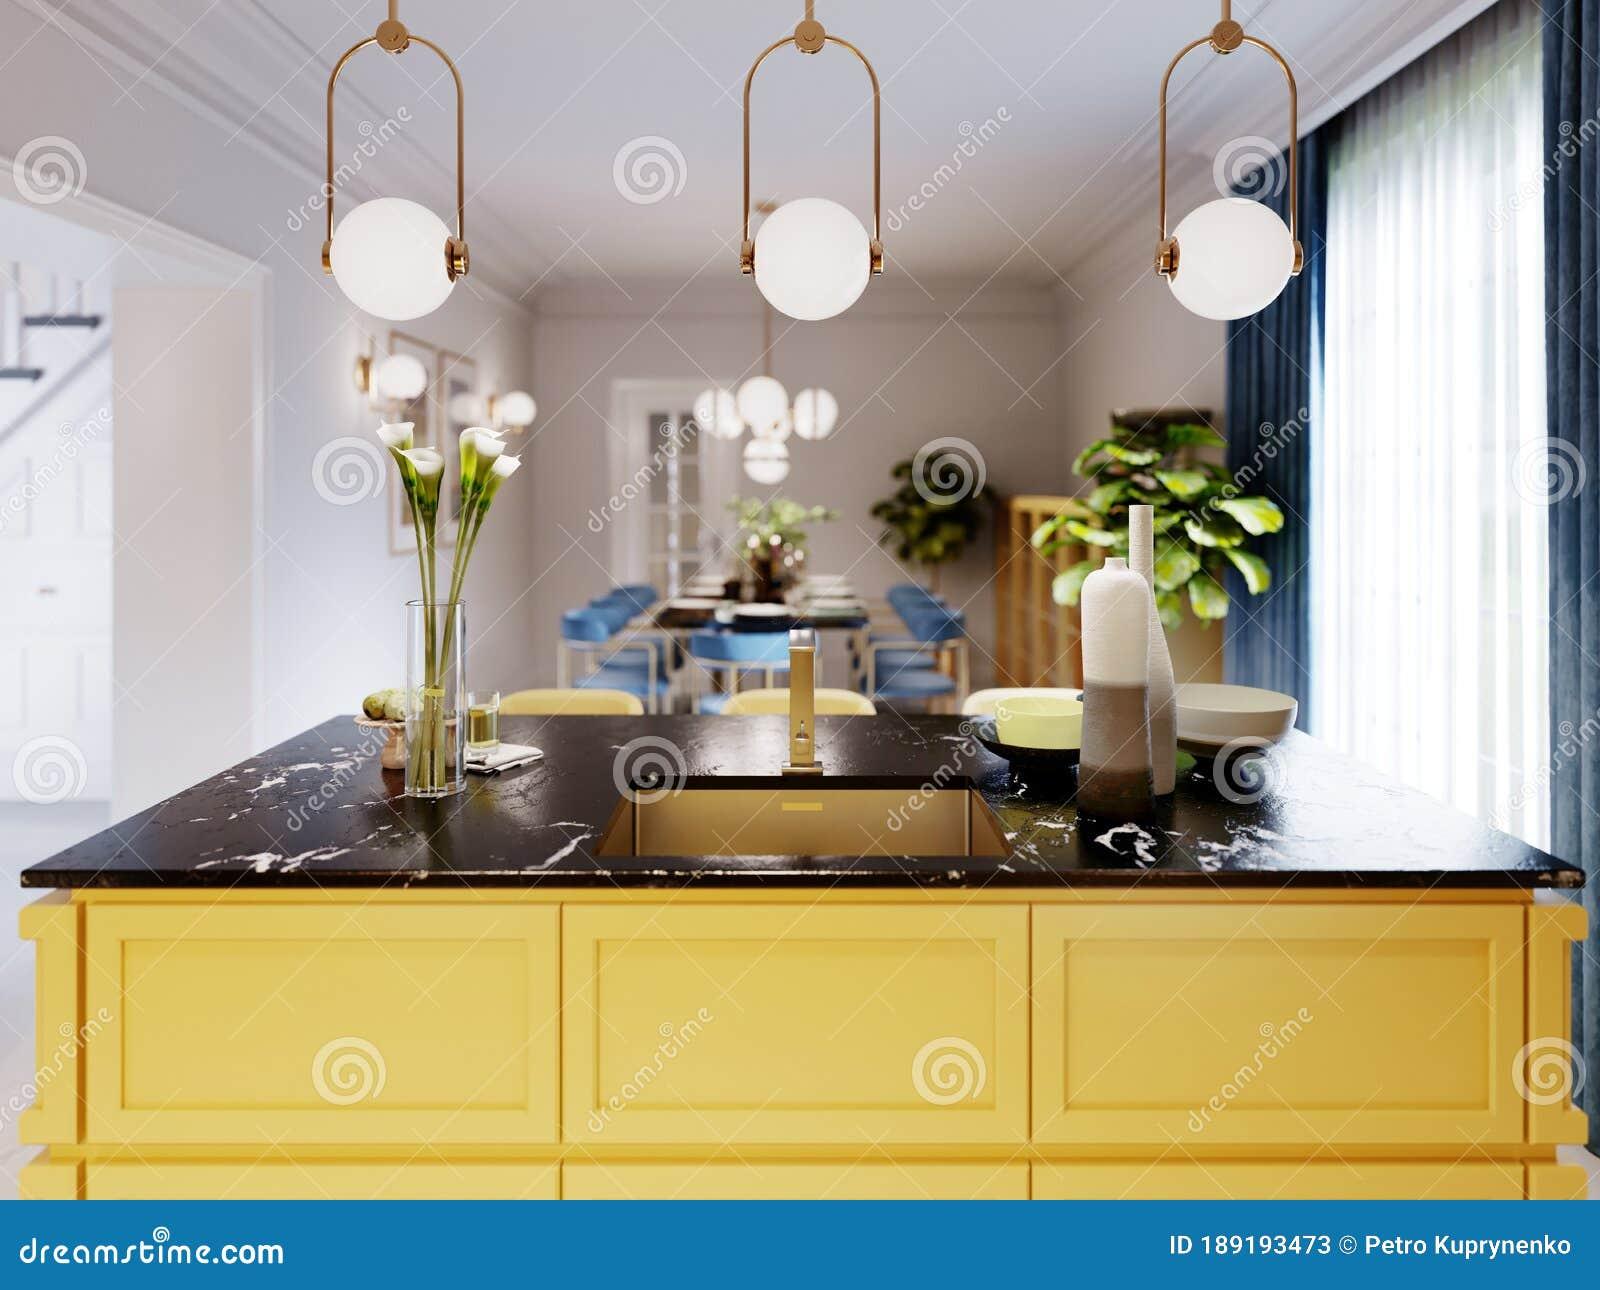 Modern Kitchen Island In Yellow Kitchen With Pendant Lamp Over Yellow Furniture Black Countertop Stock Illustration Illustration Of Interior Kitchen 189193473